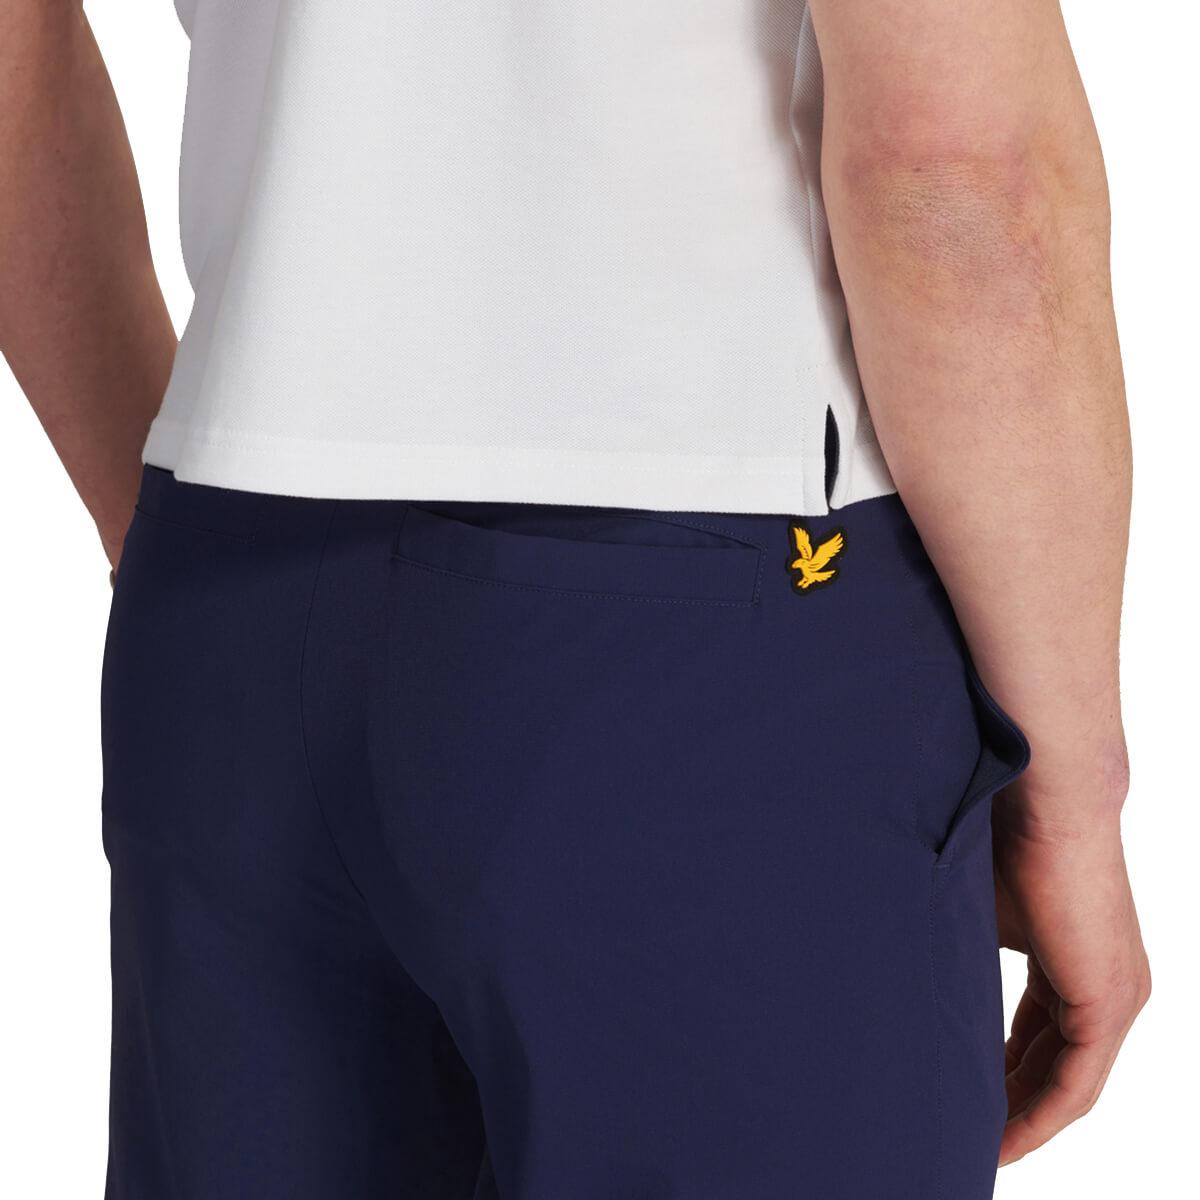 thumbnail 6 - Lyle & Scott Mens Golf Tech Light Stretch Breathable Trousers 55% OFF RRP